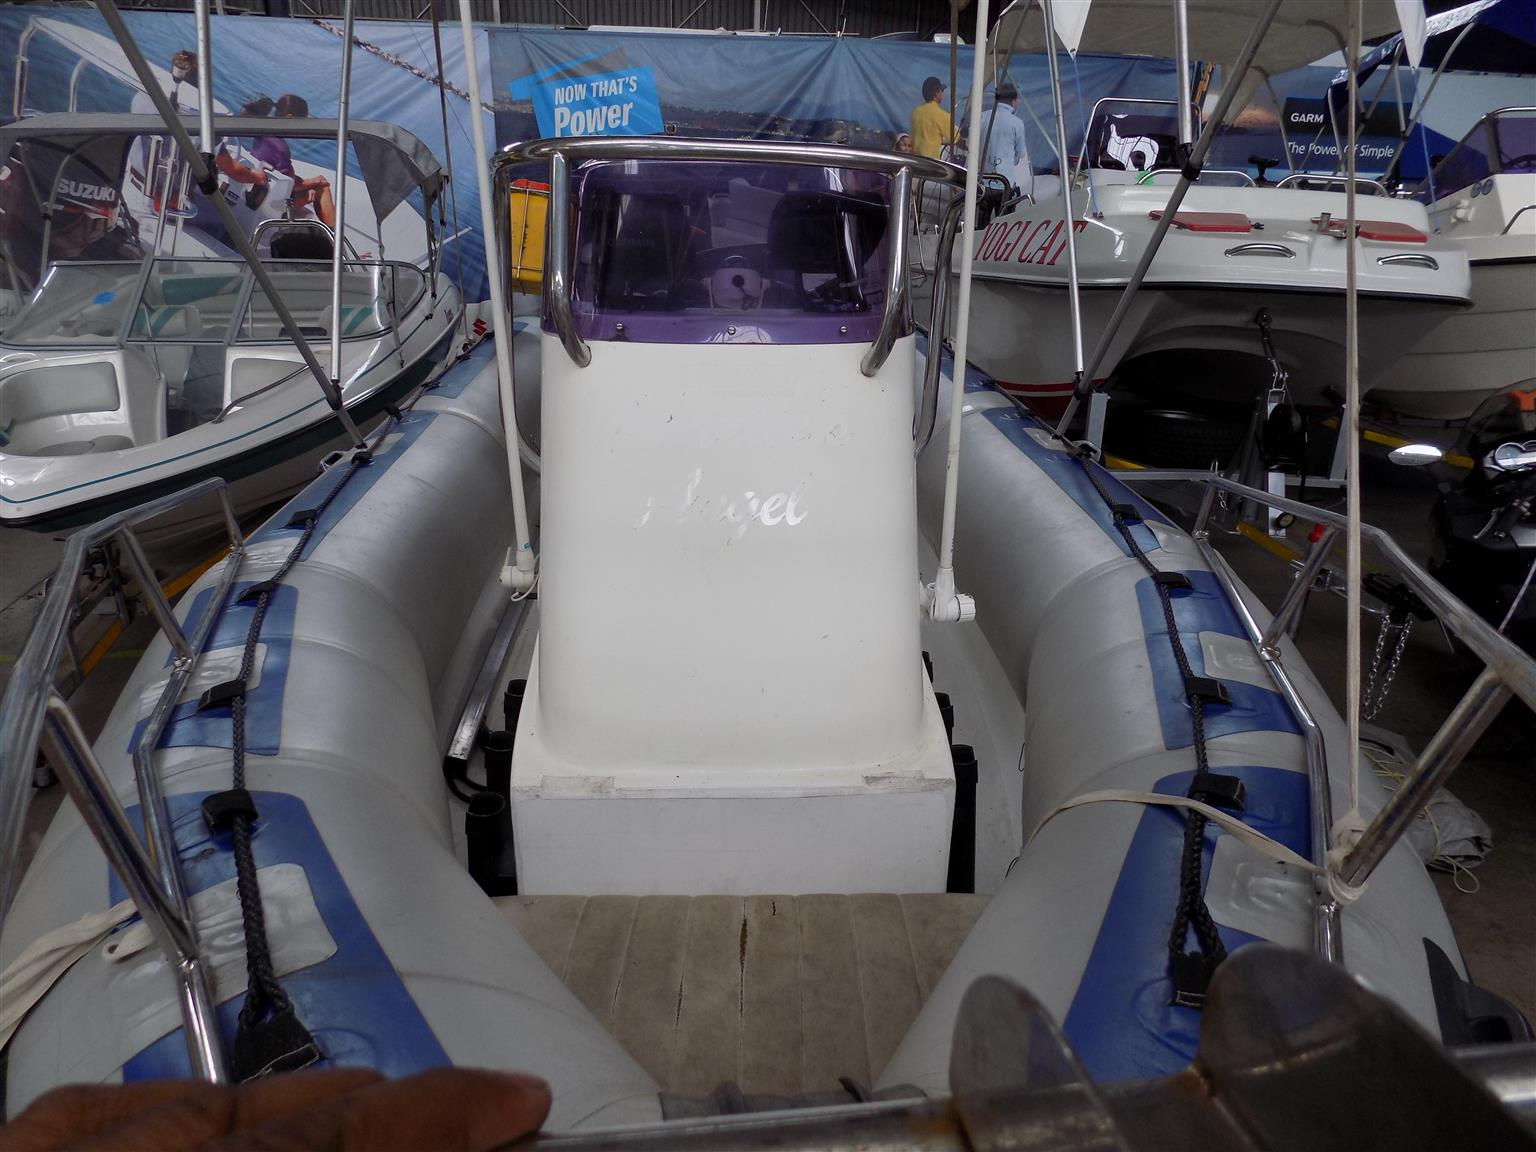 gemini 5,7 metre mono hull on trailer 2 x 60 hp yamaha trims